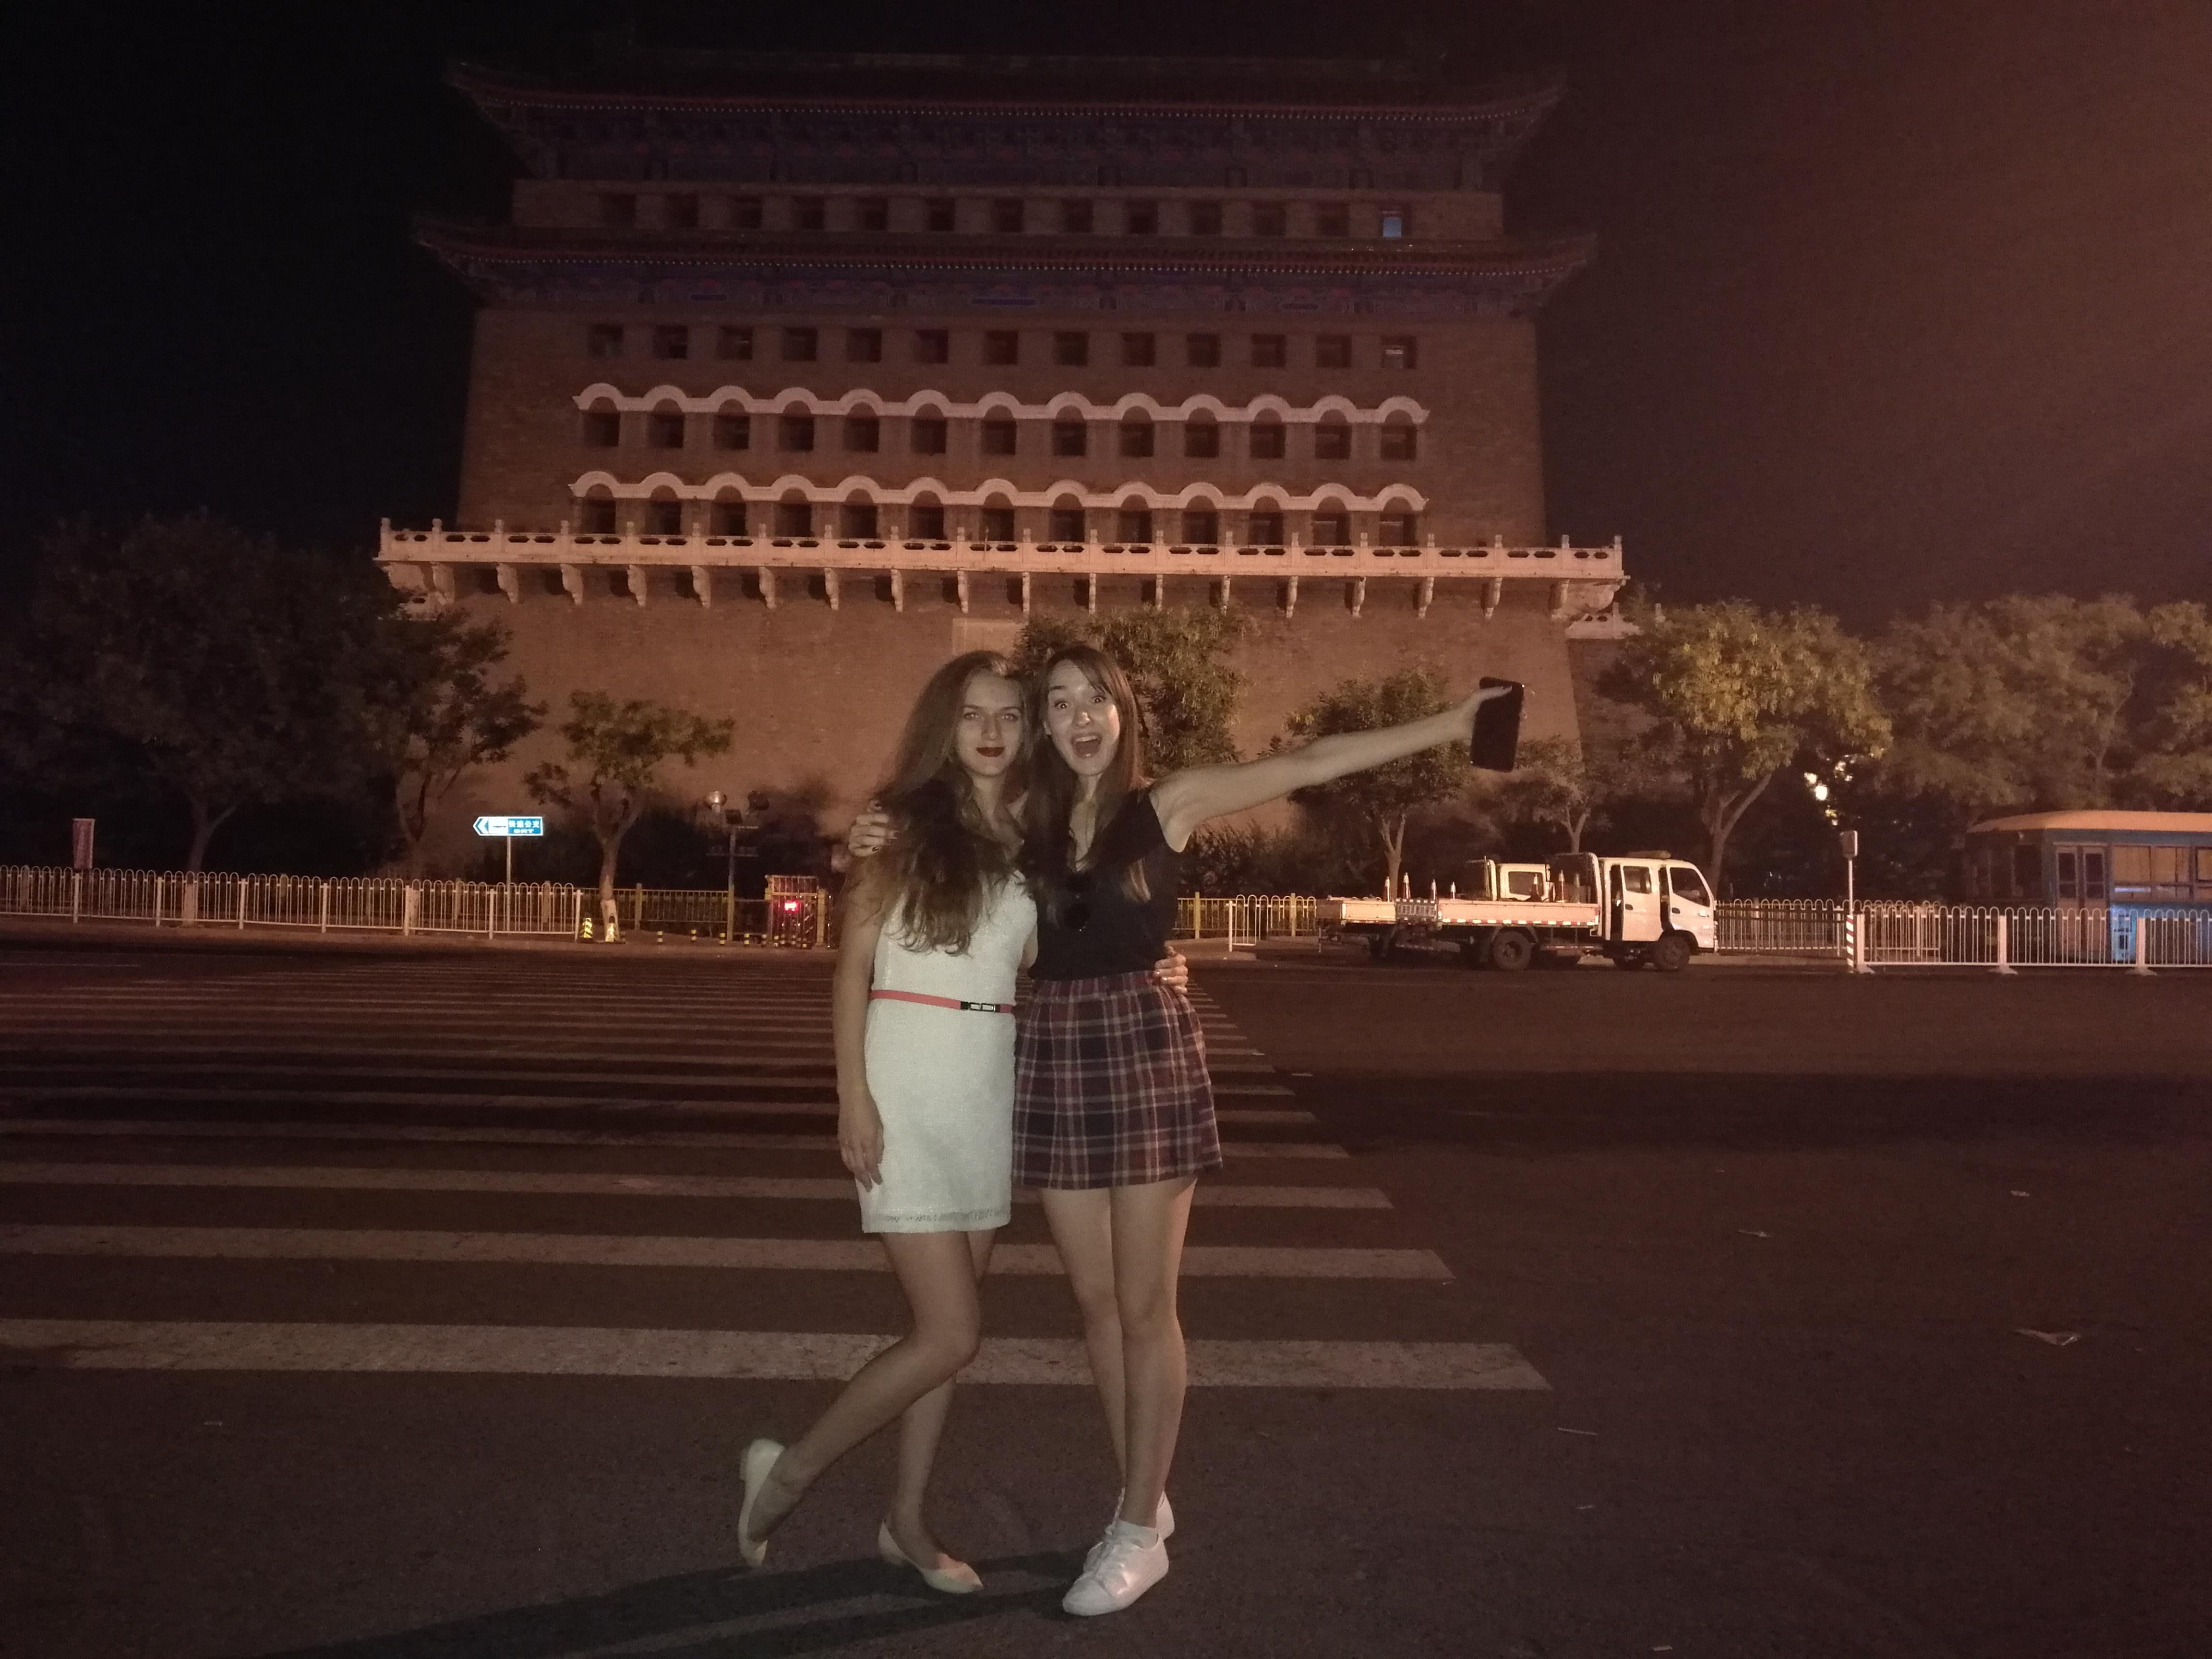 One night in Beijing